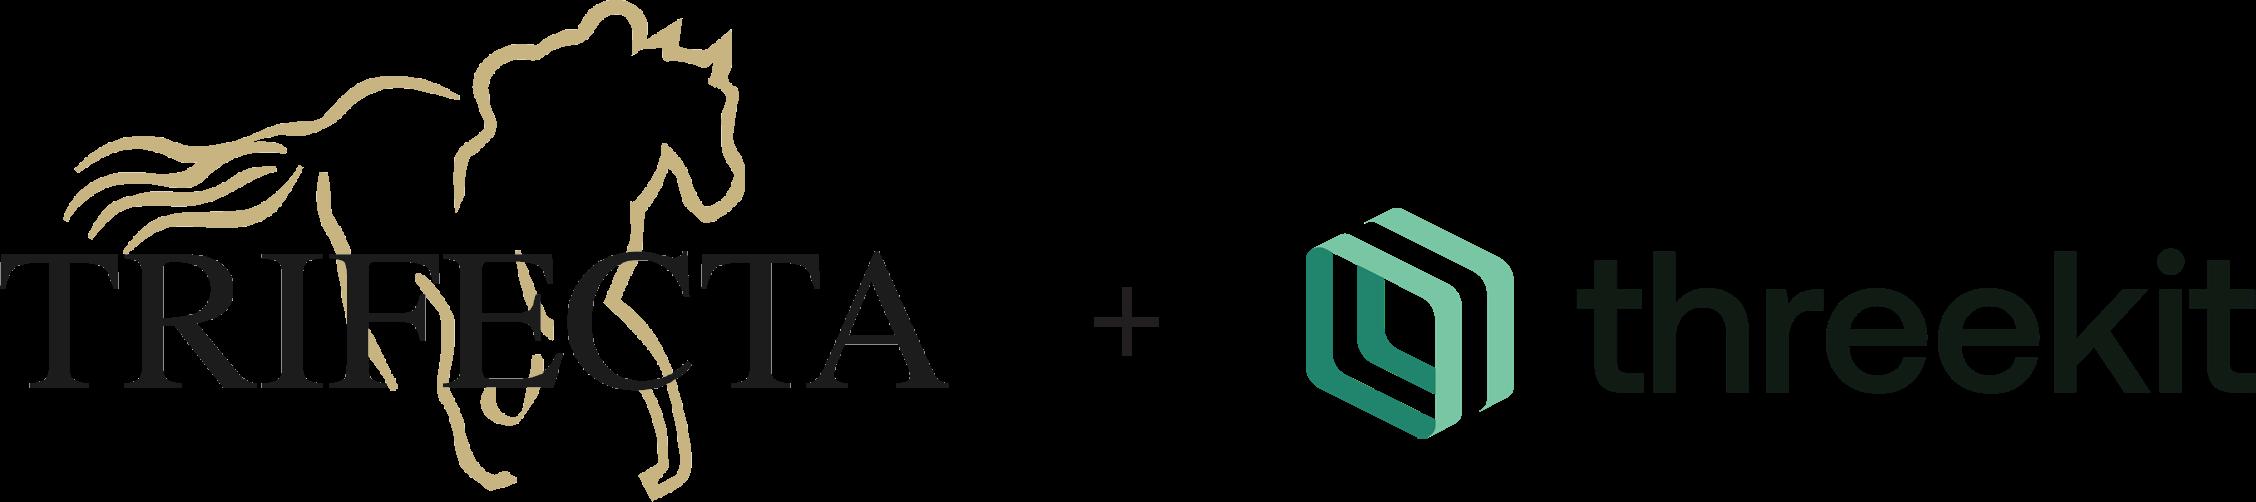 Trifecta+Threekit_Logos